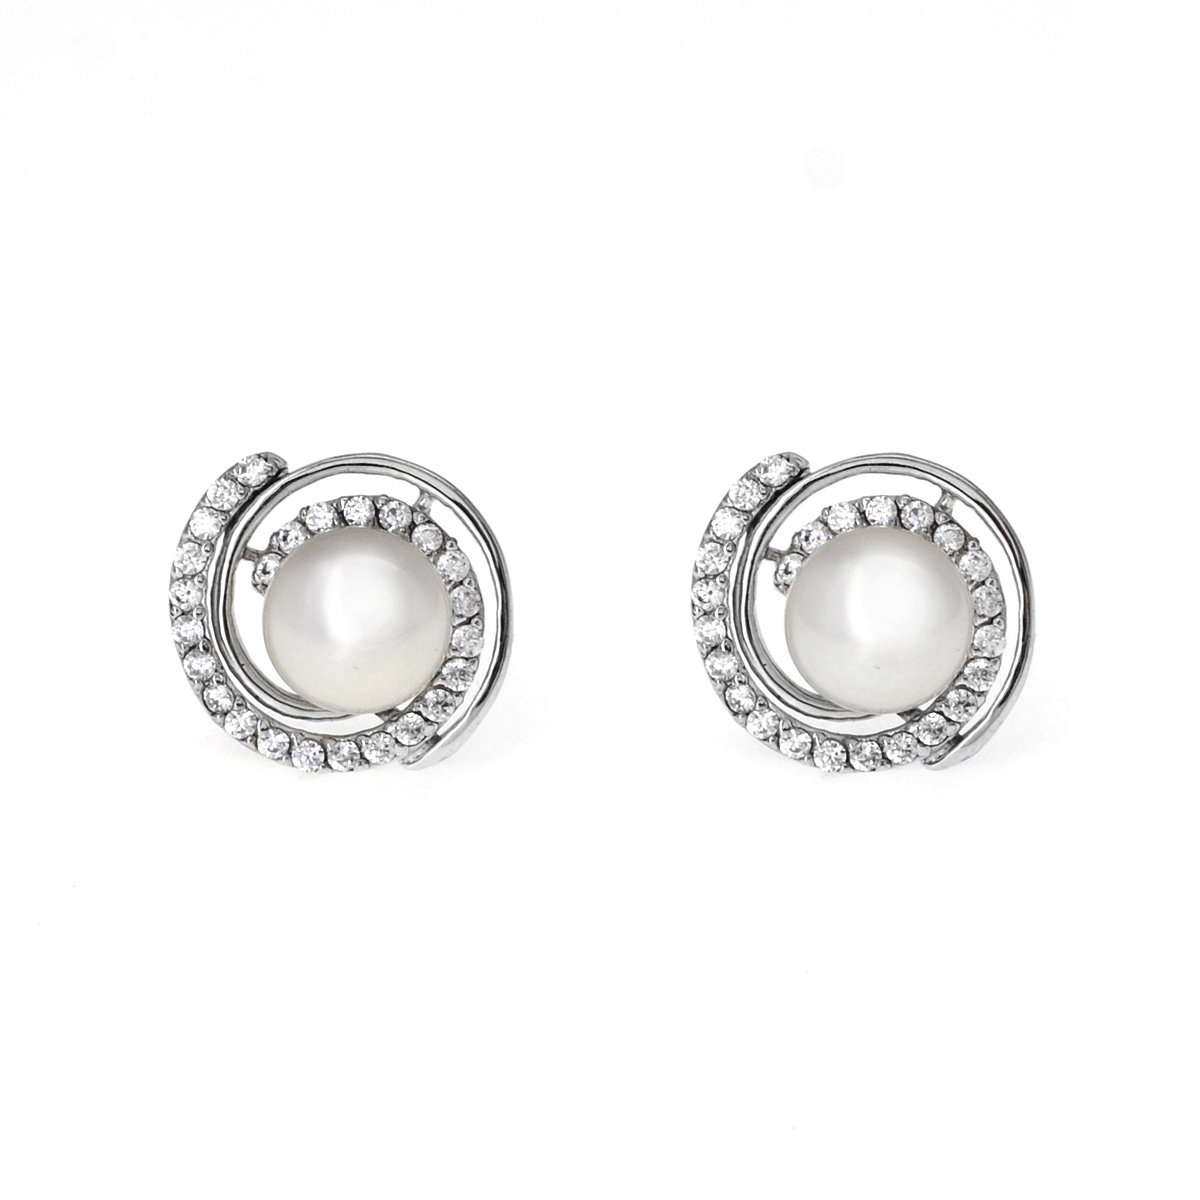 Vortex- 淡水珍珠配925銀鑲白鋯石耳環